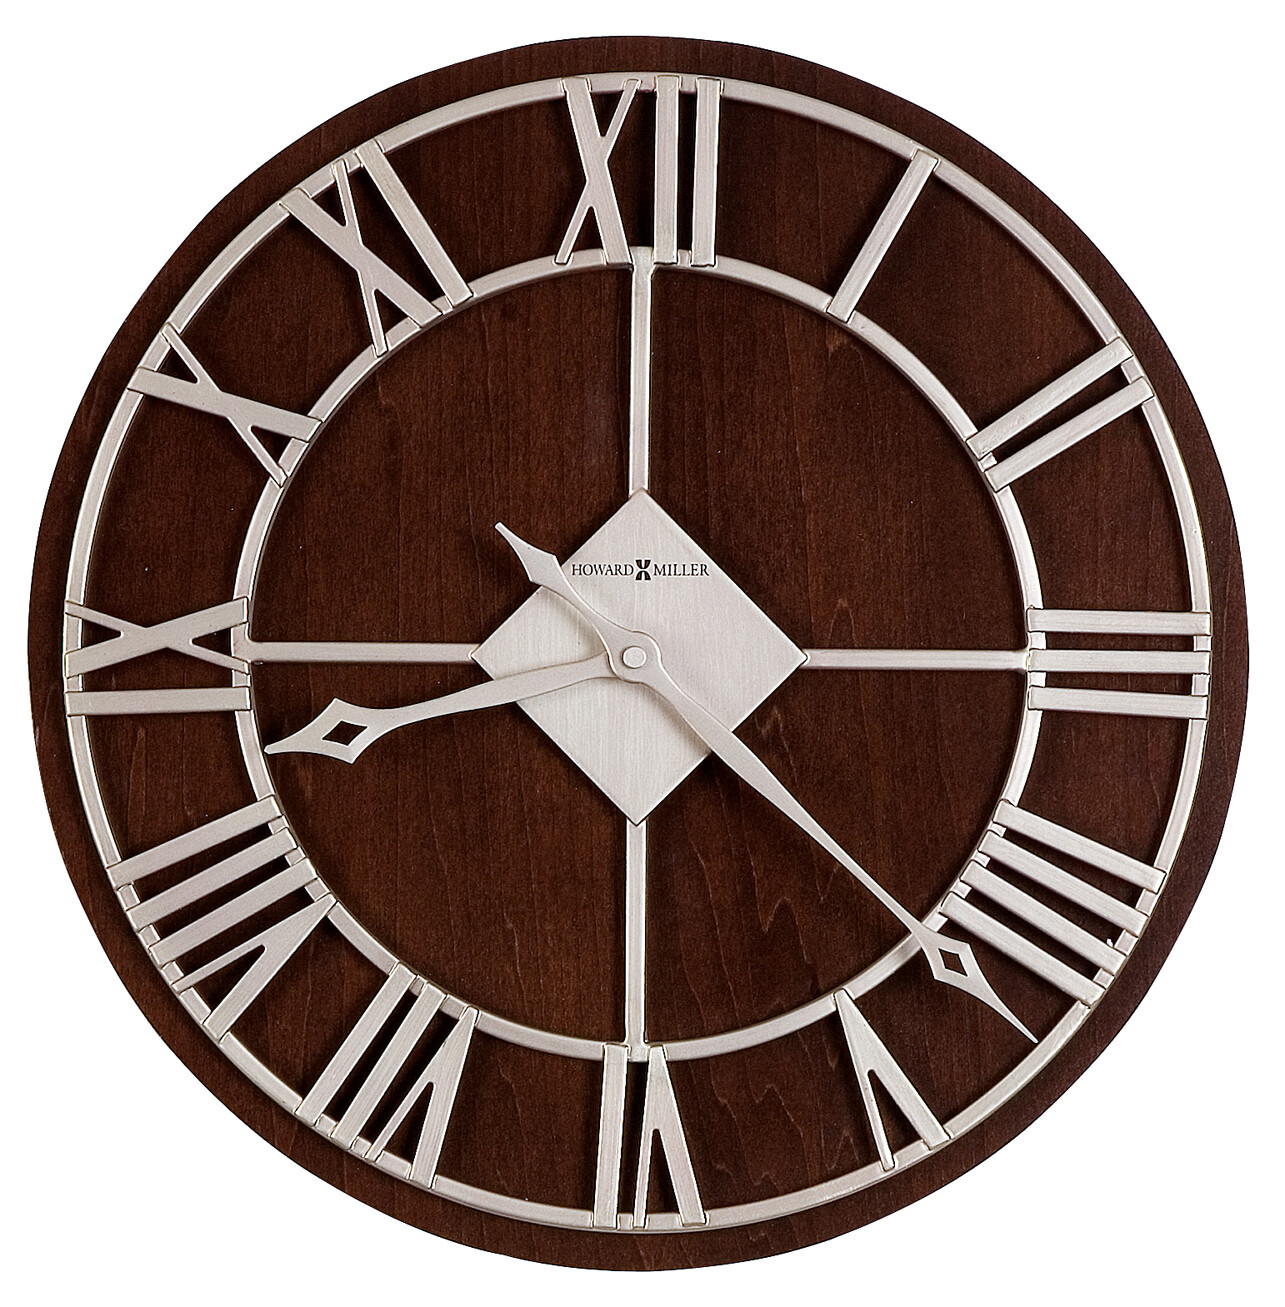 Howard Miller Prichard 625496 Wall Clock